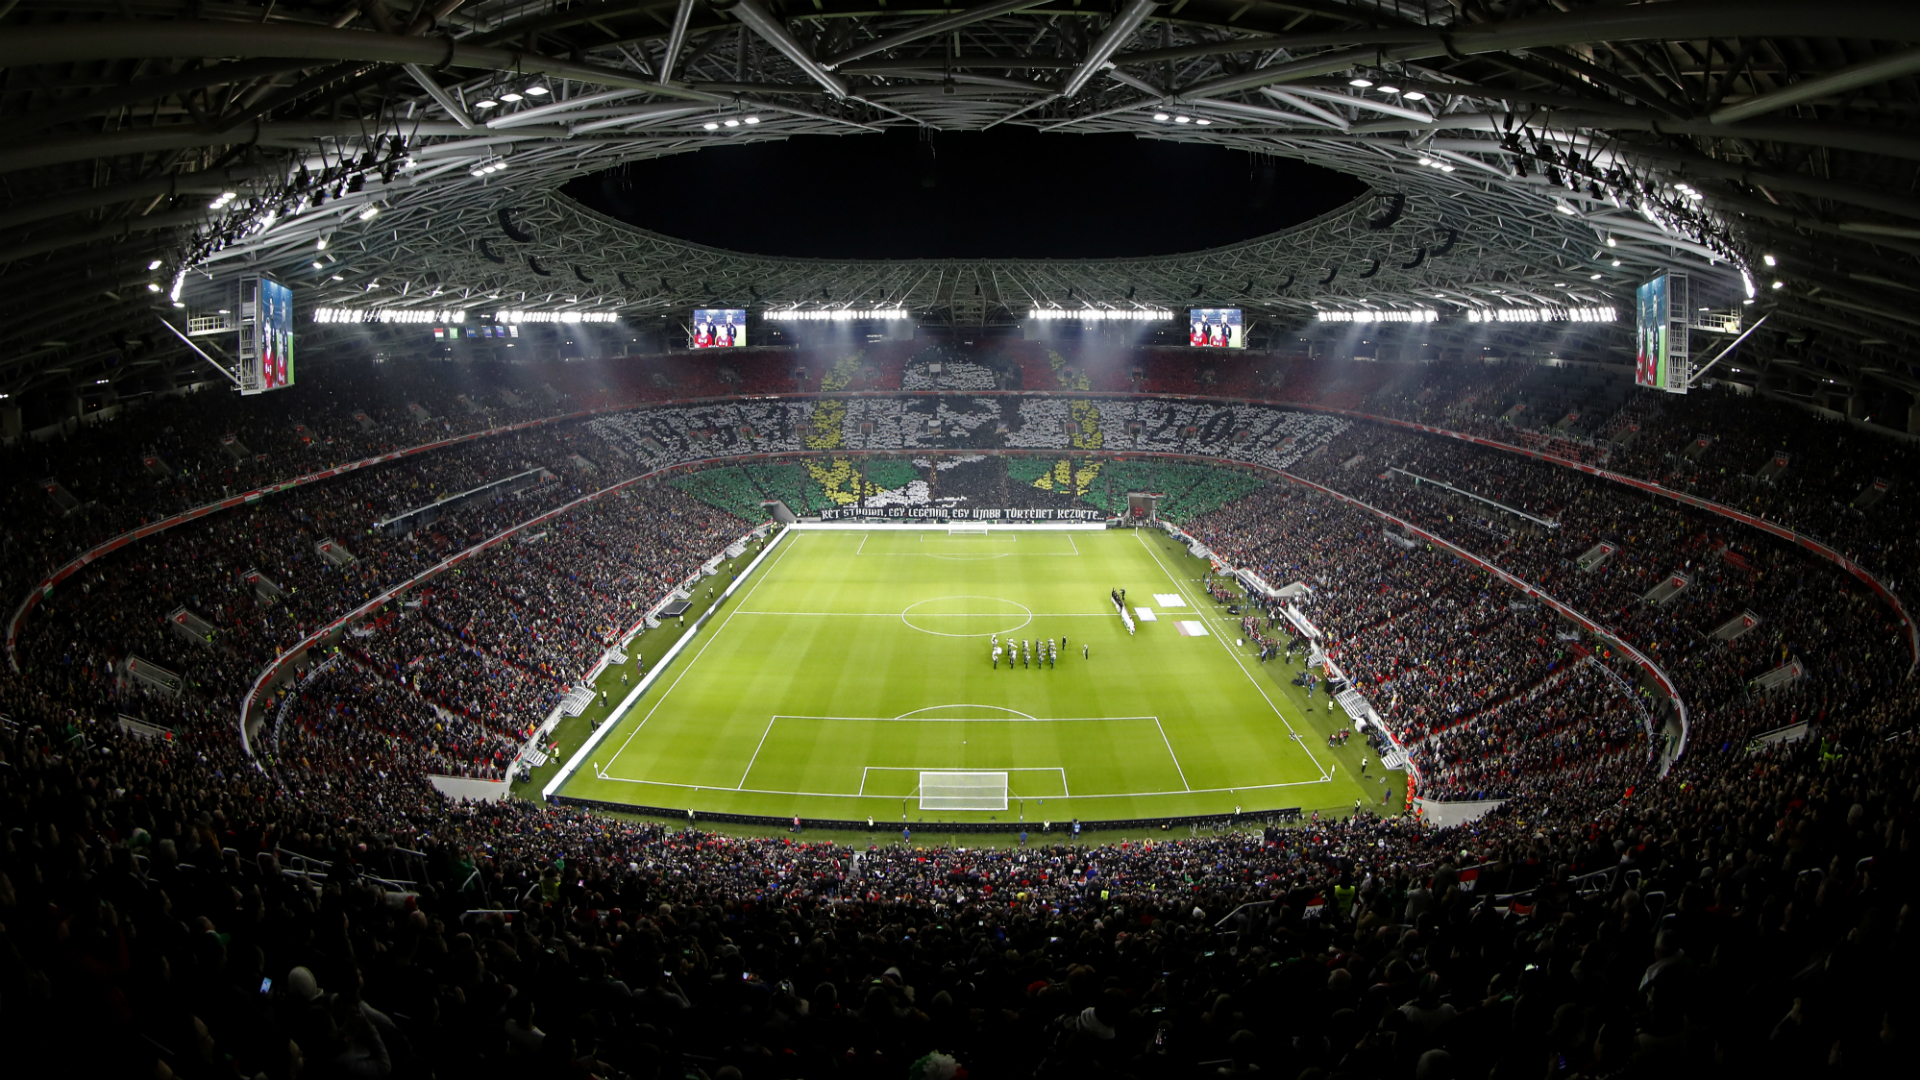 Hungary 1-2 Uruguay: Cavani on target as hosts lose Puskas Arena opener